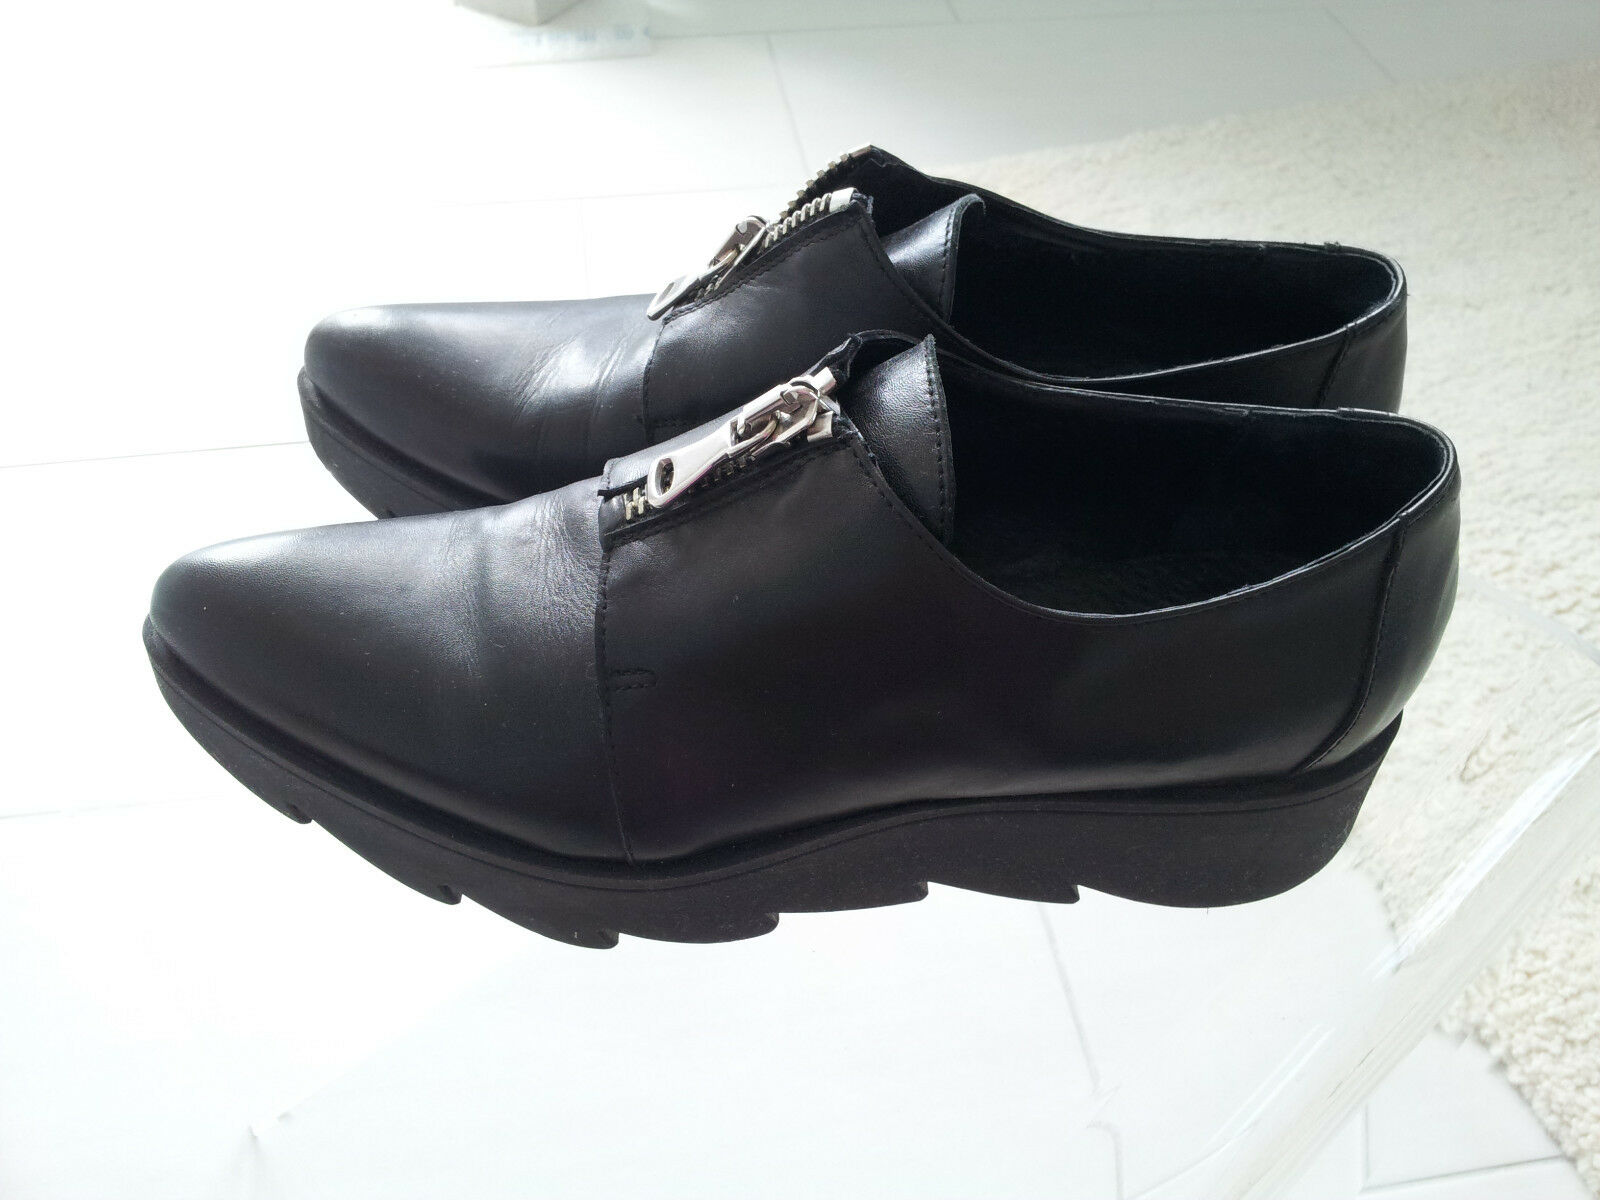 Schwarze spitze Schuhe Halbschuhe Phillip Hardy Reißverschluss Spitze top Gr. 40